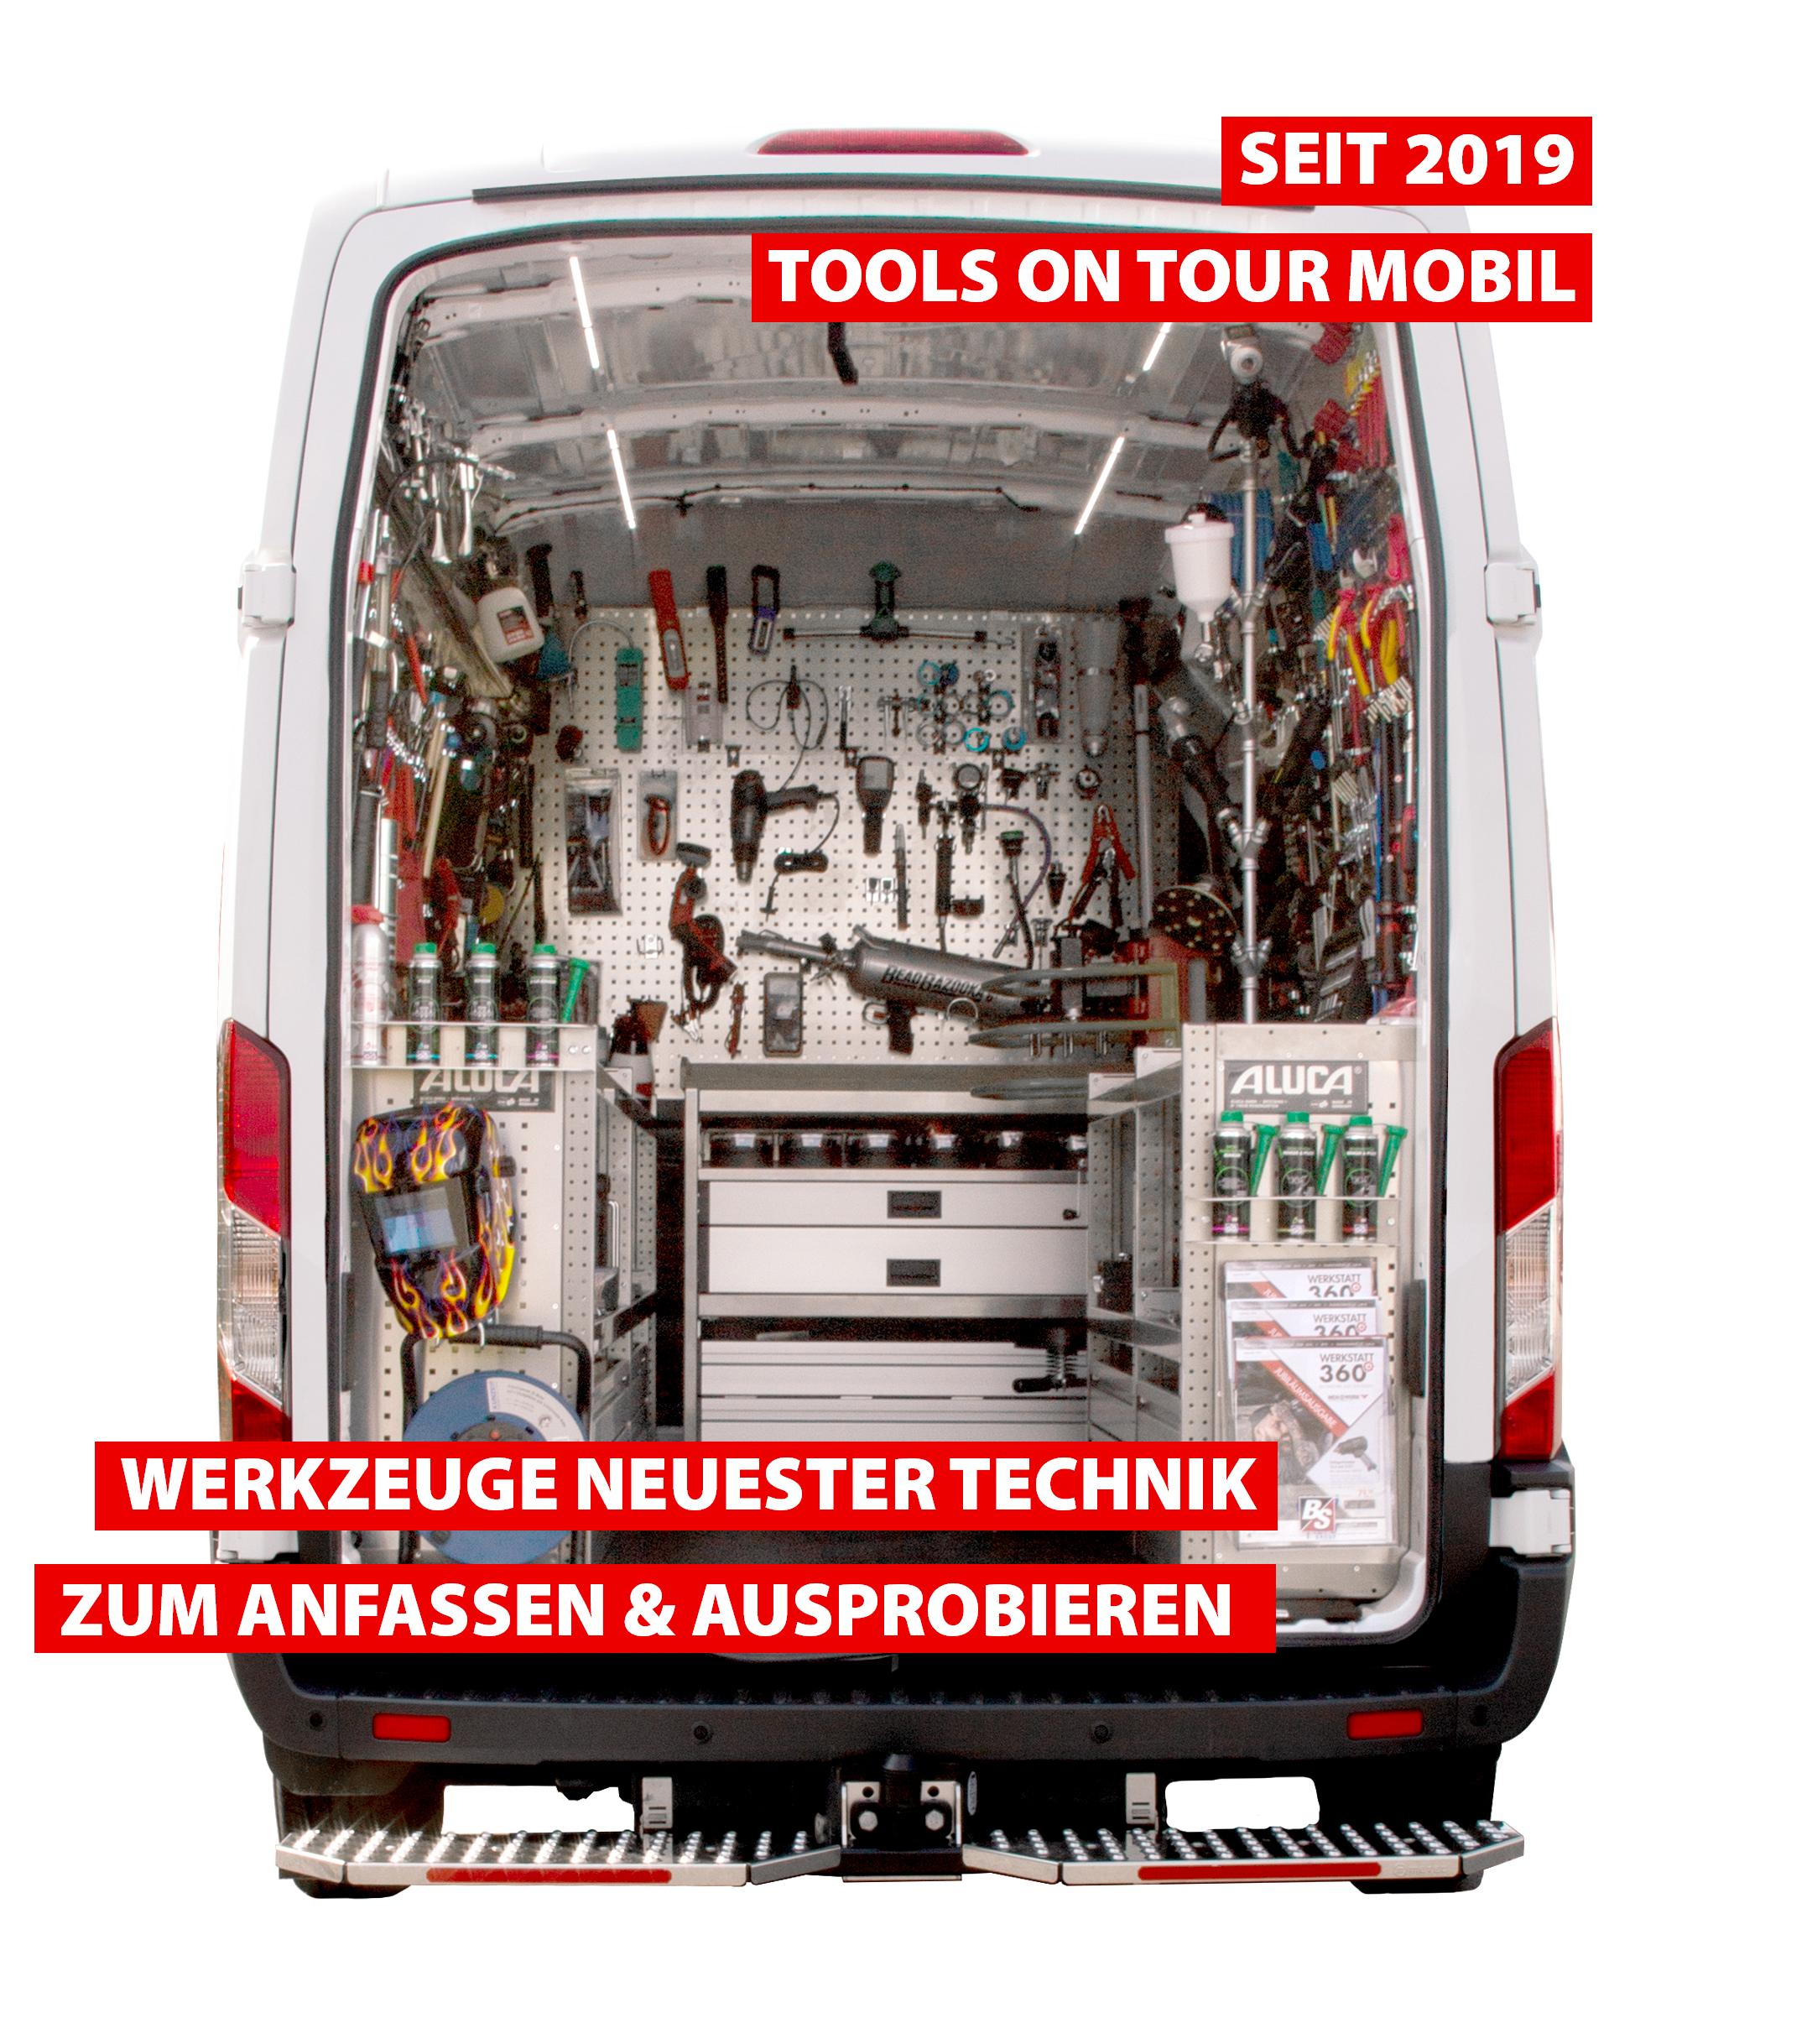 toolsontour